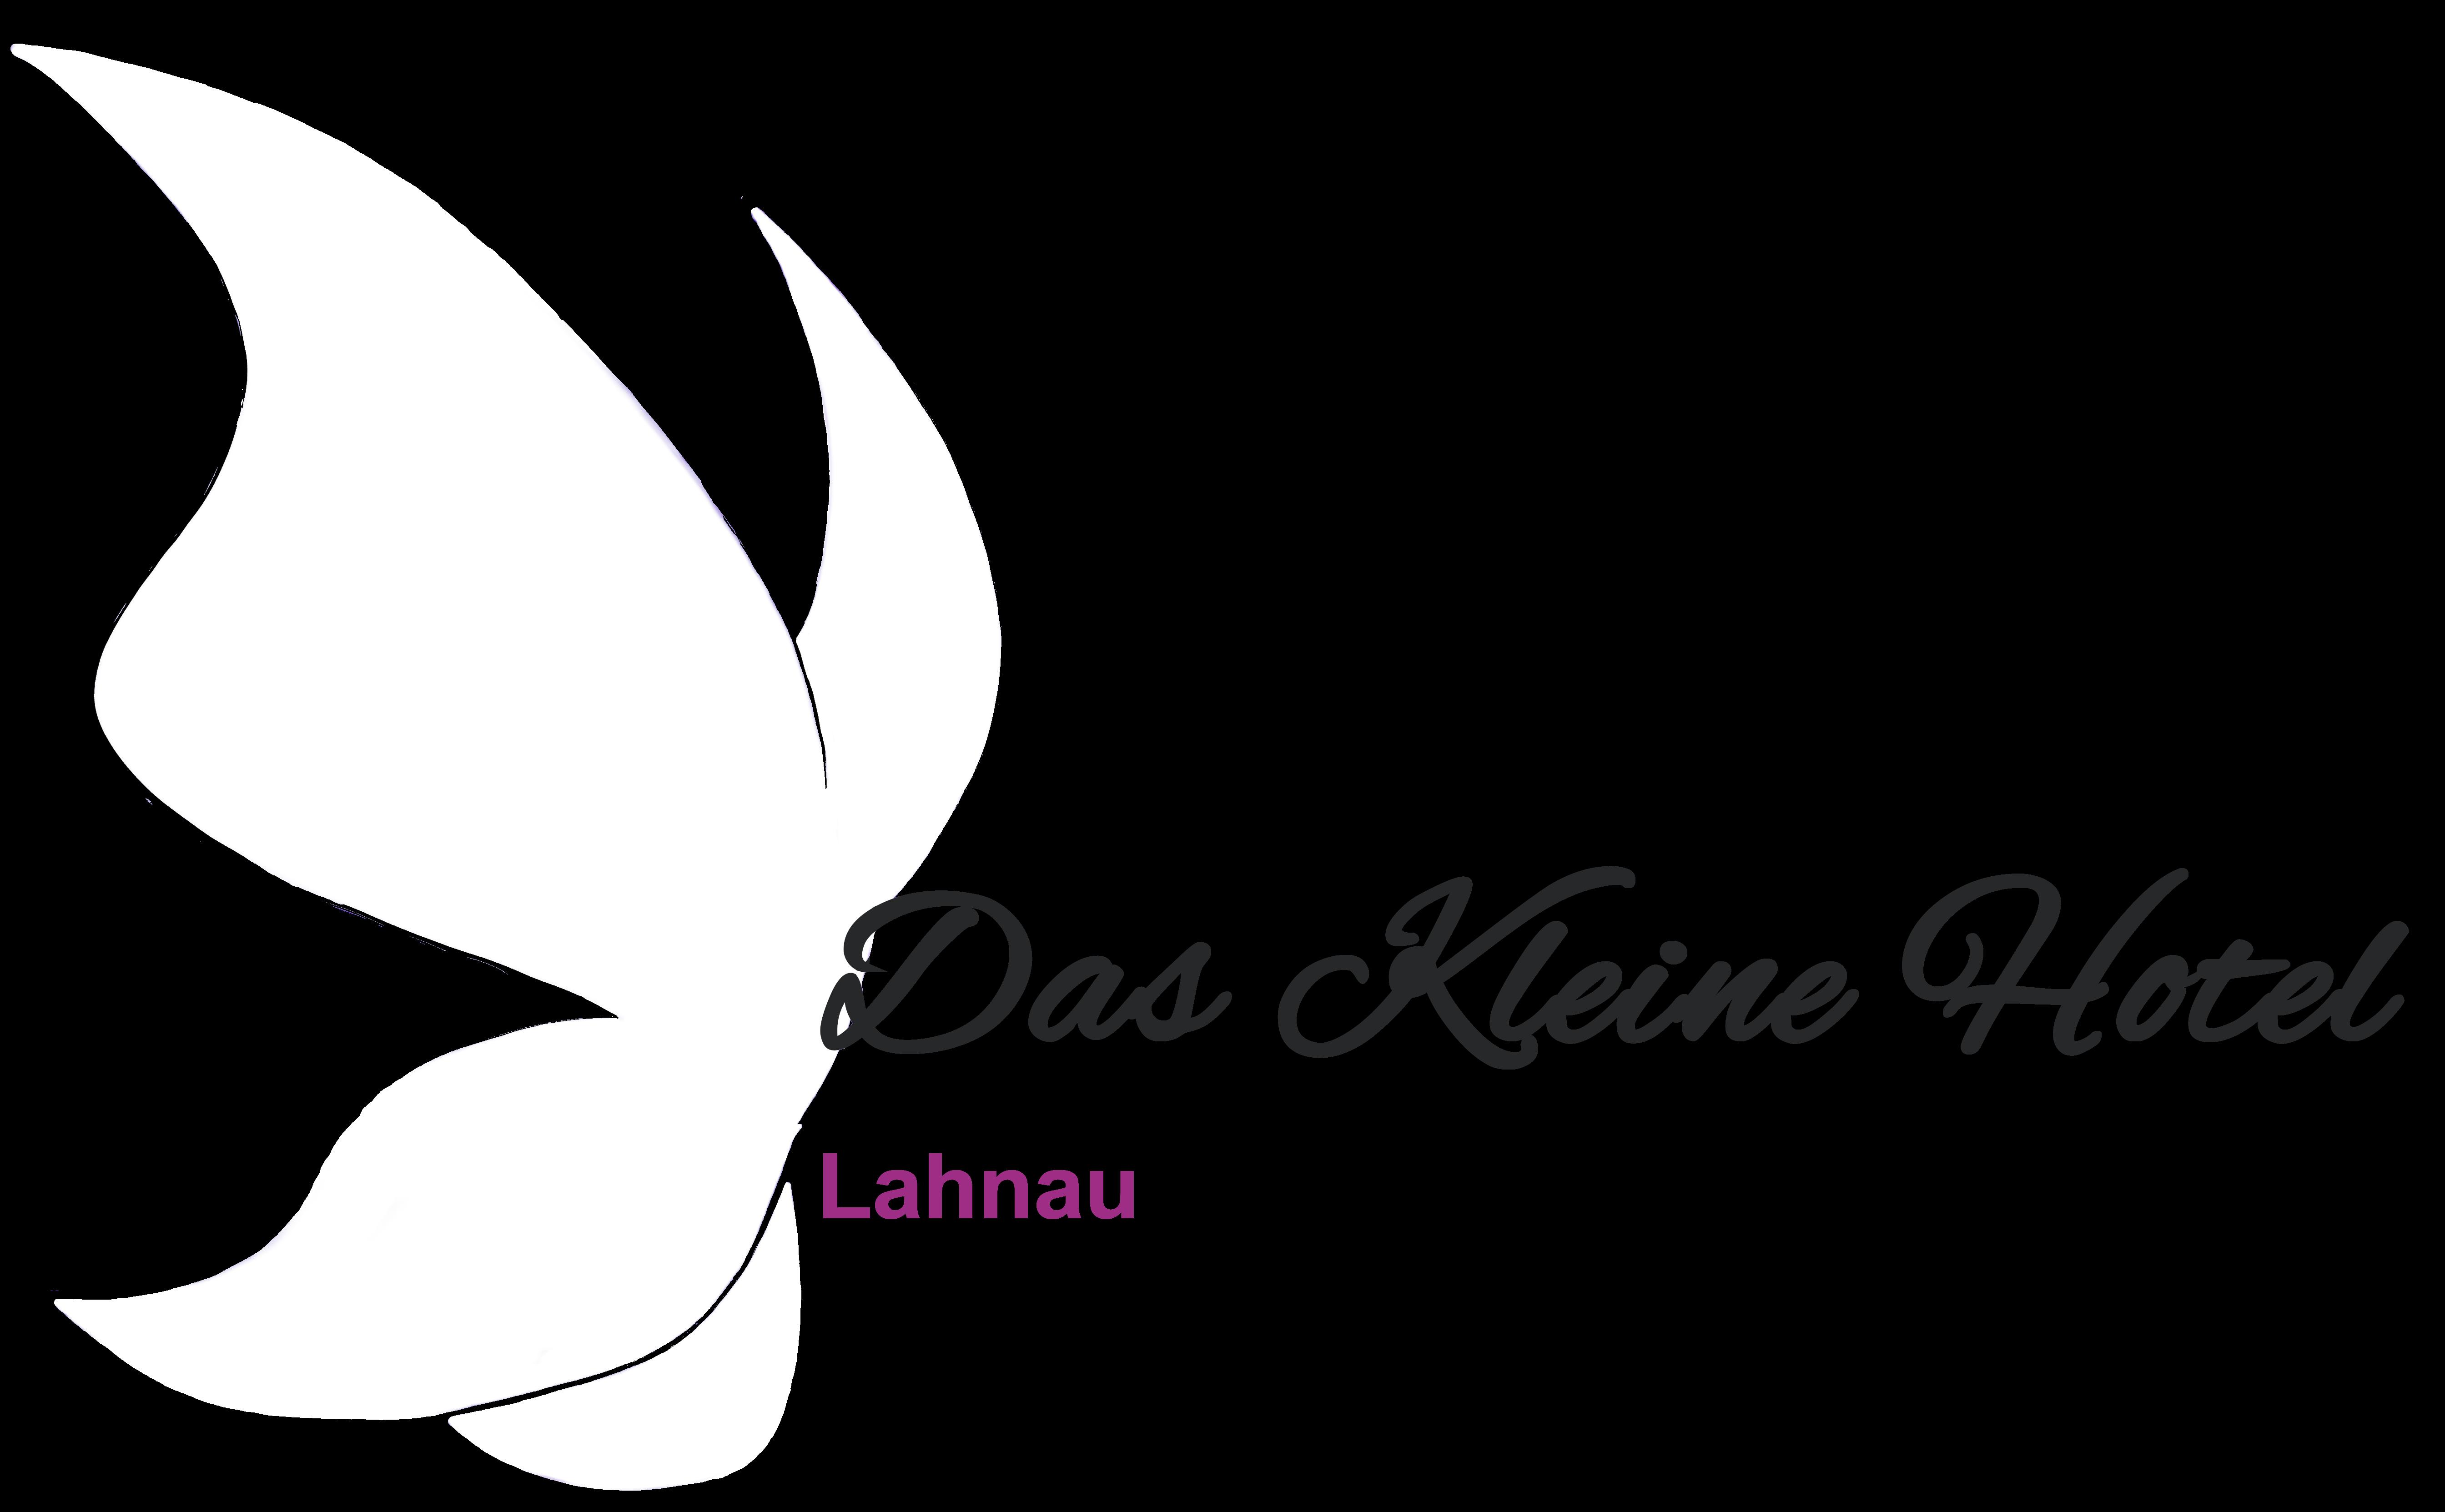 Das kleine Hotel Lahnau